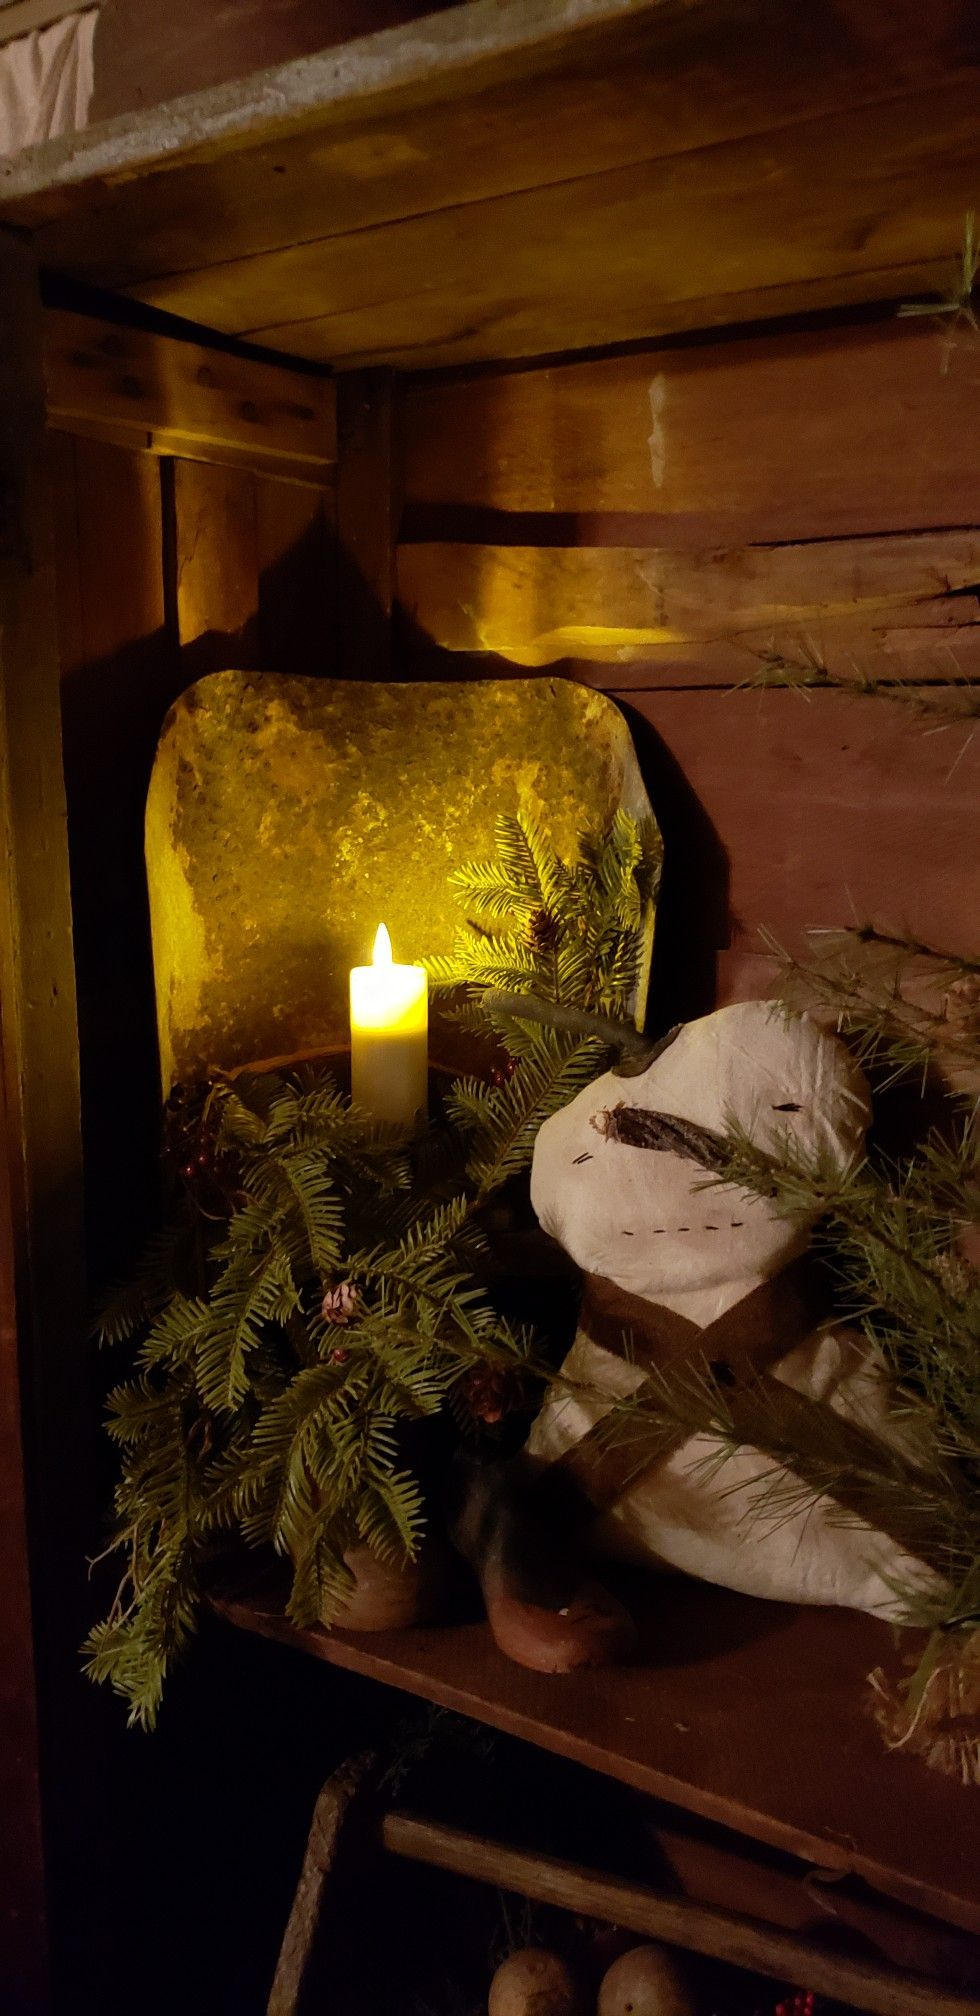 Greenery ,snowman & light make a cozy Christmas! 2018 ...